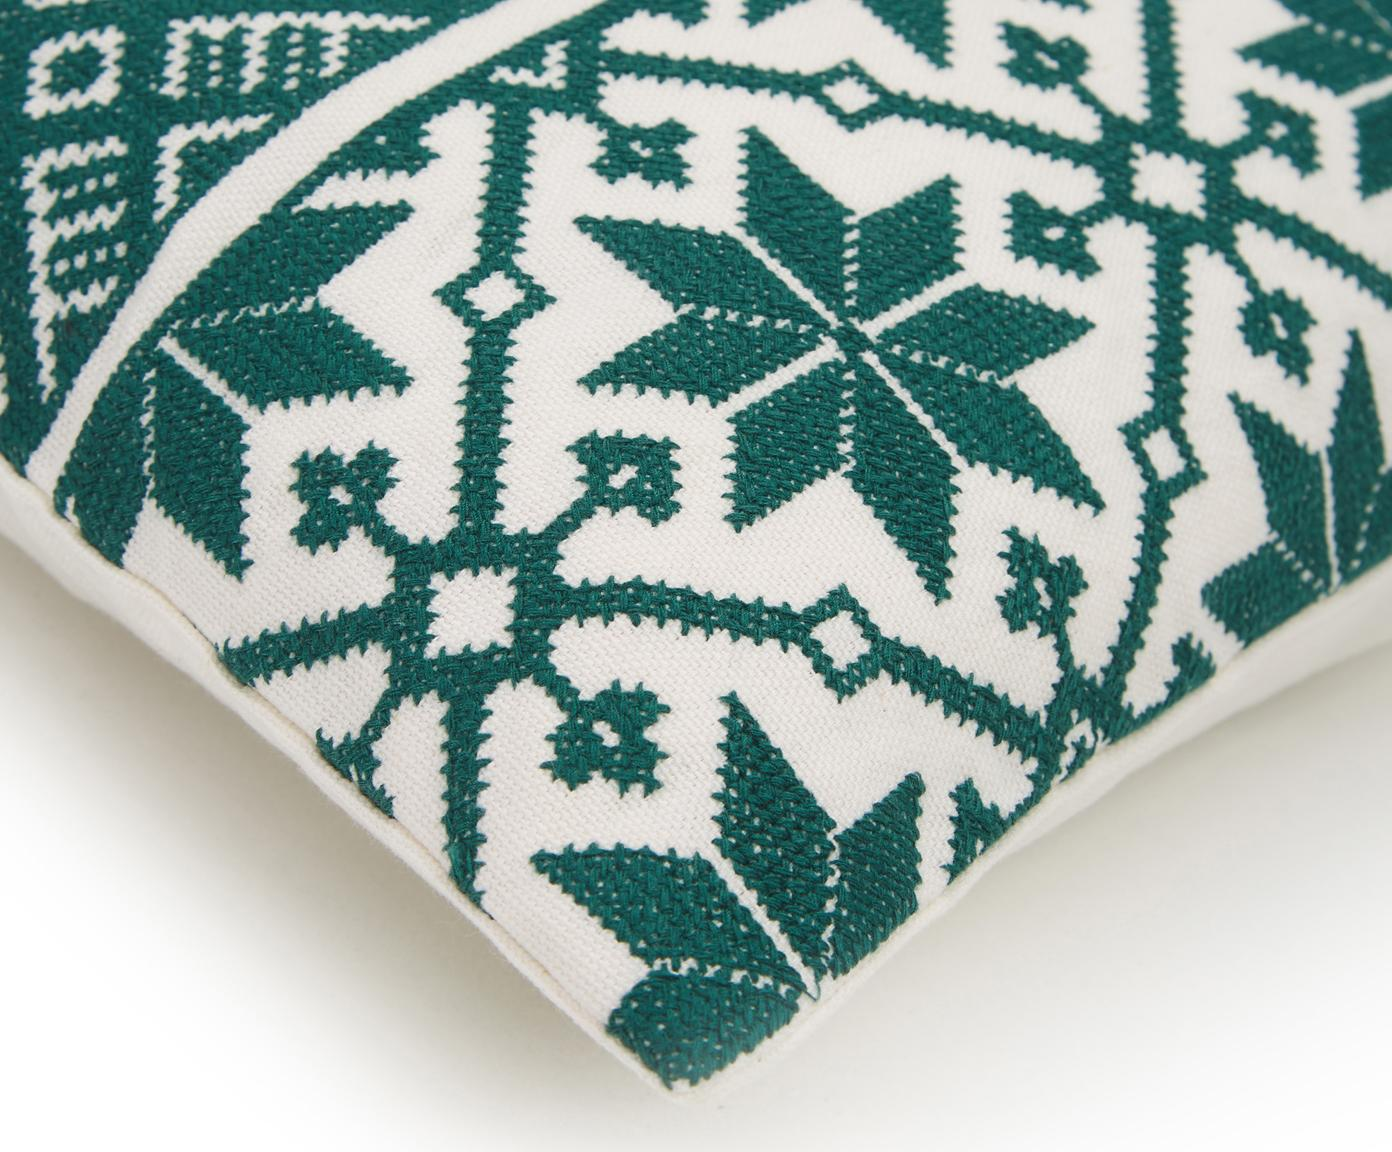 Funda de cojín bordada Shetland, 100%algodón, Verde, blanco crema, An 30 x L 50 cm